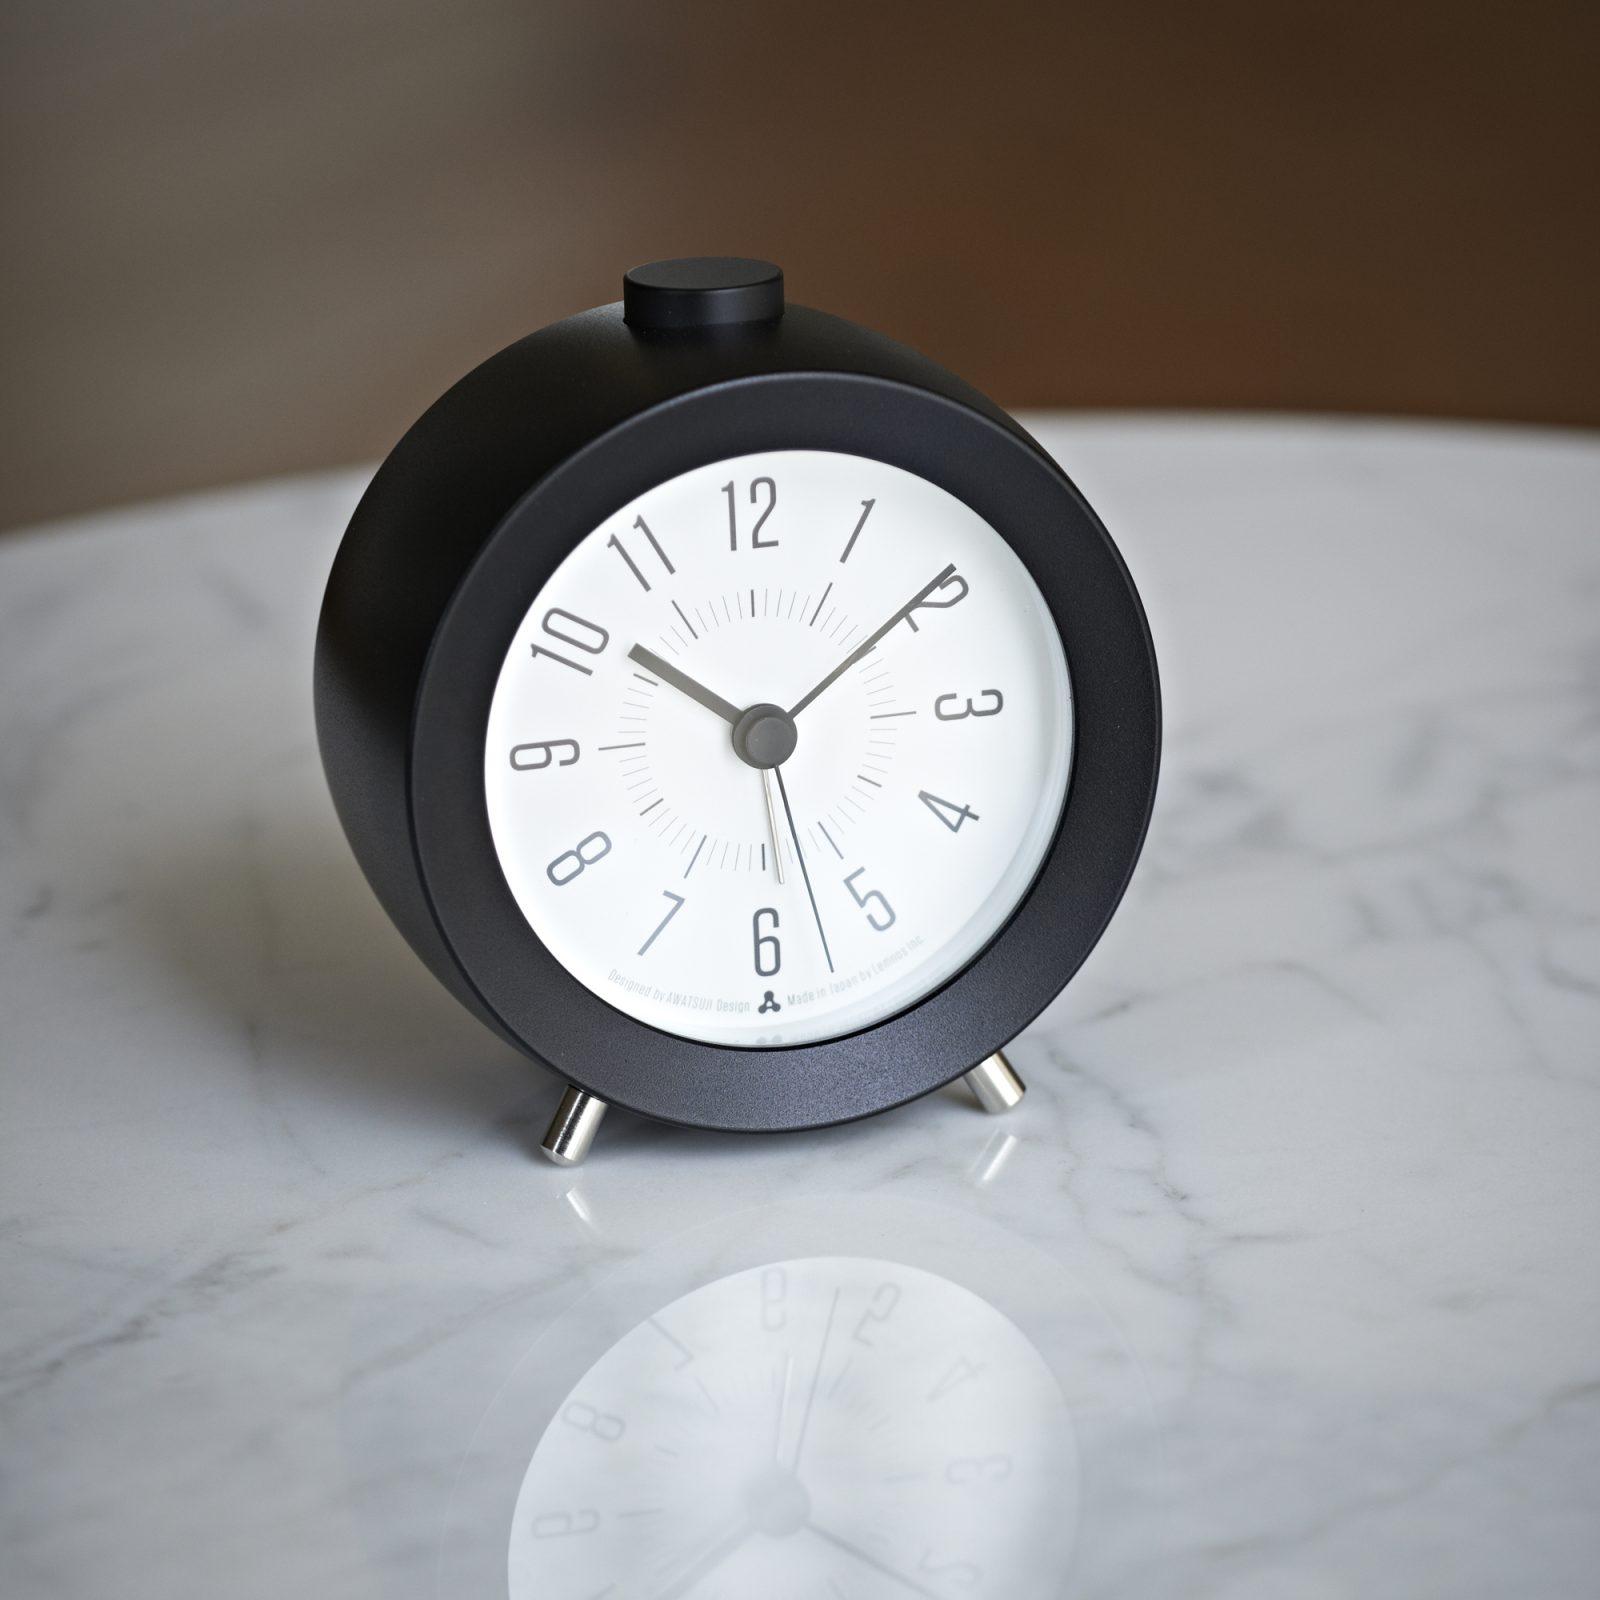 jiji-alarm-clock-black